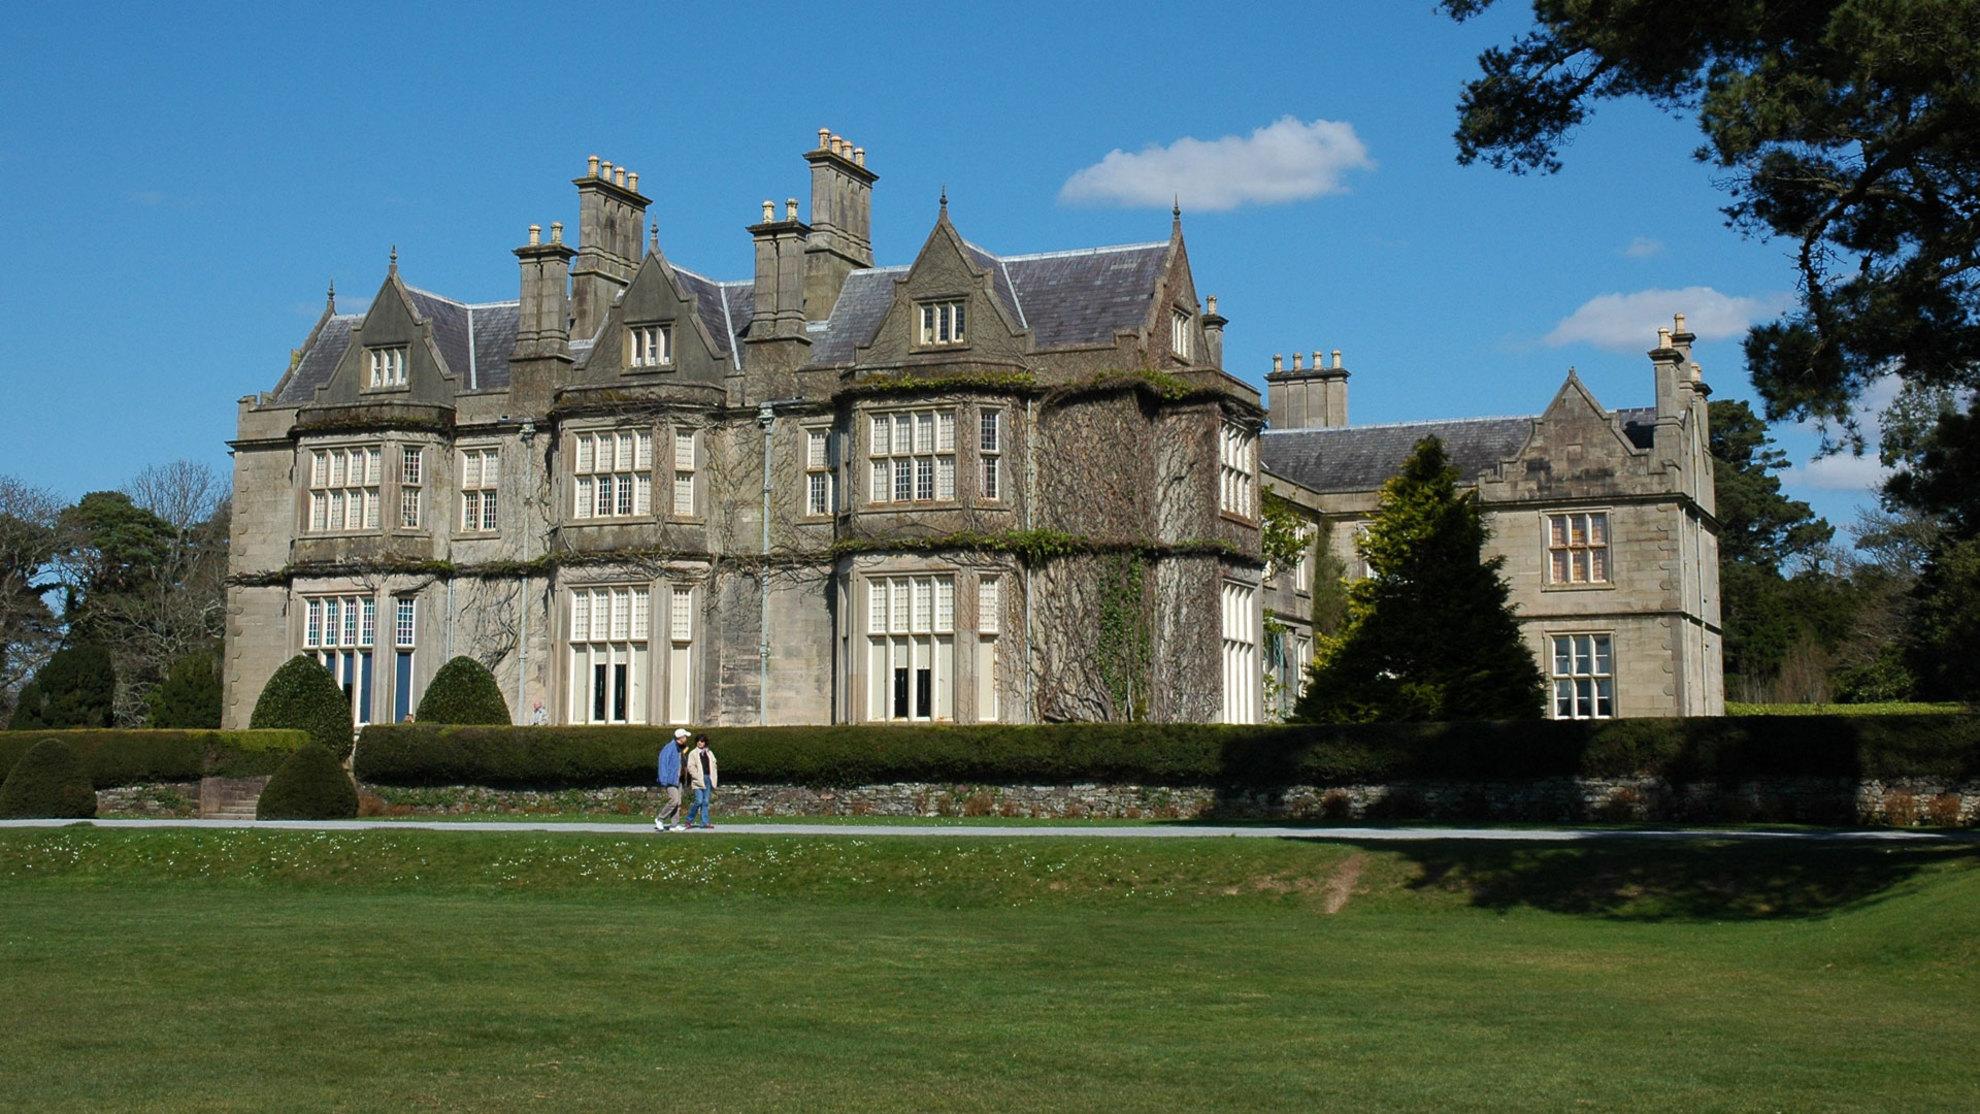 The  Muckross house